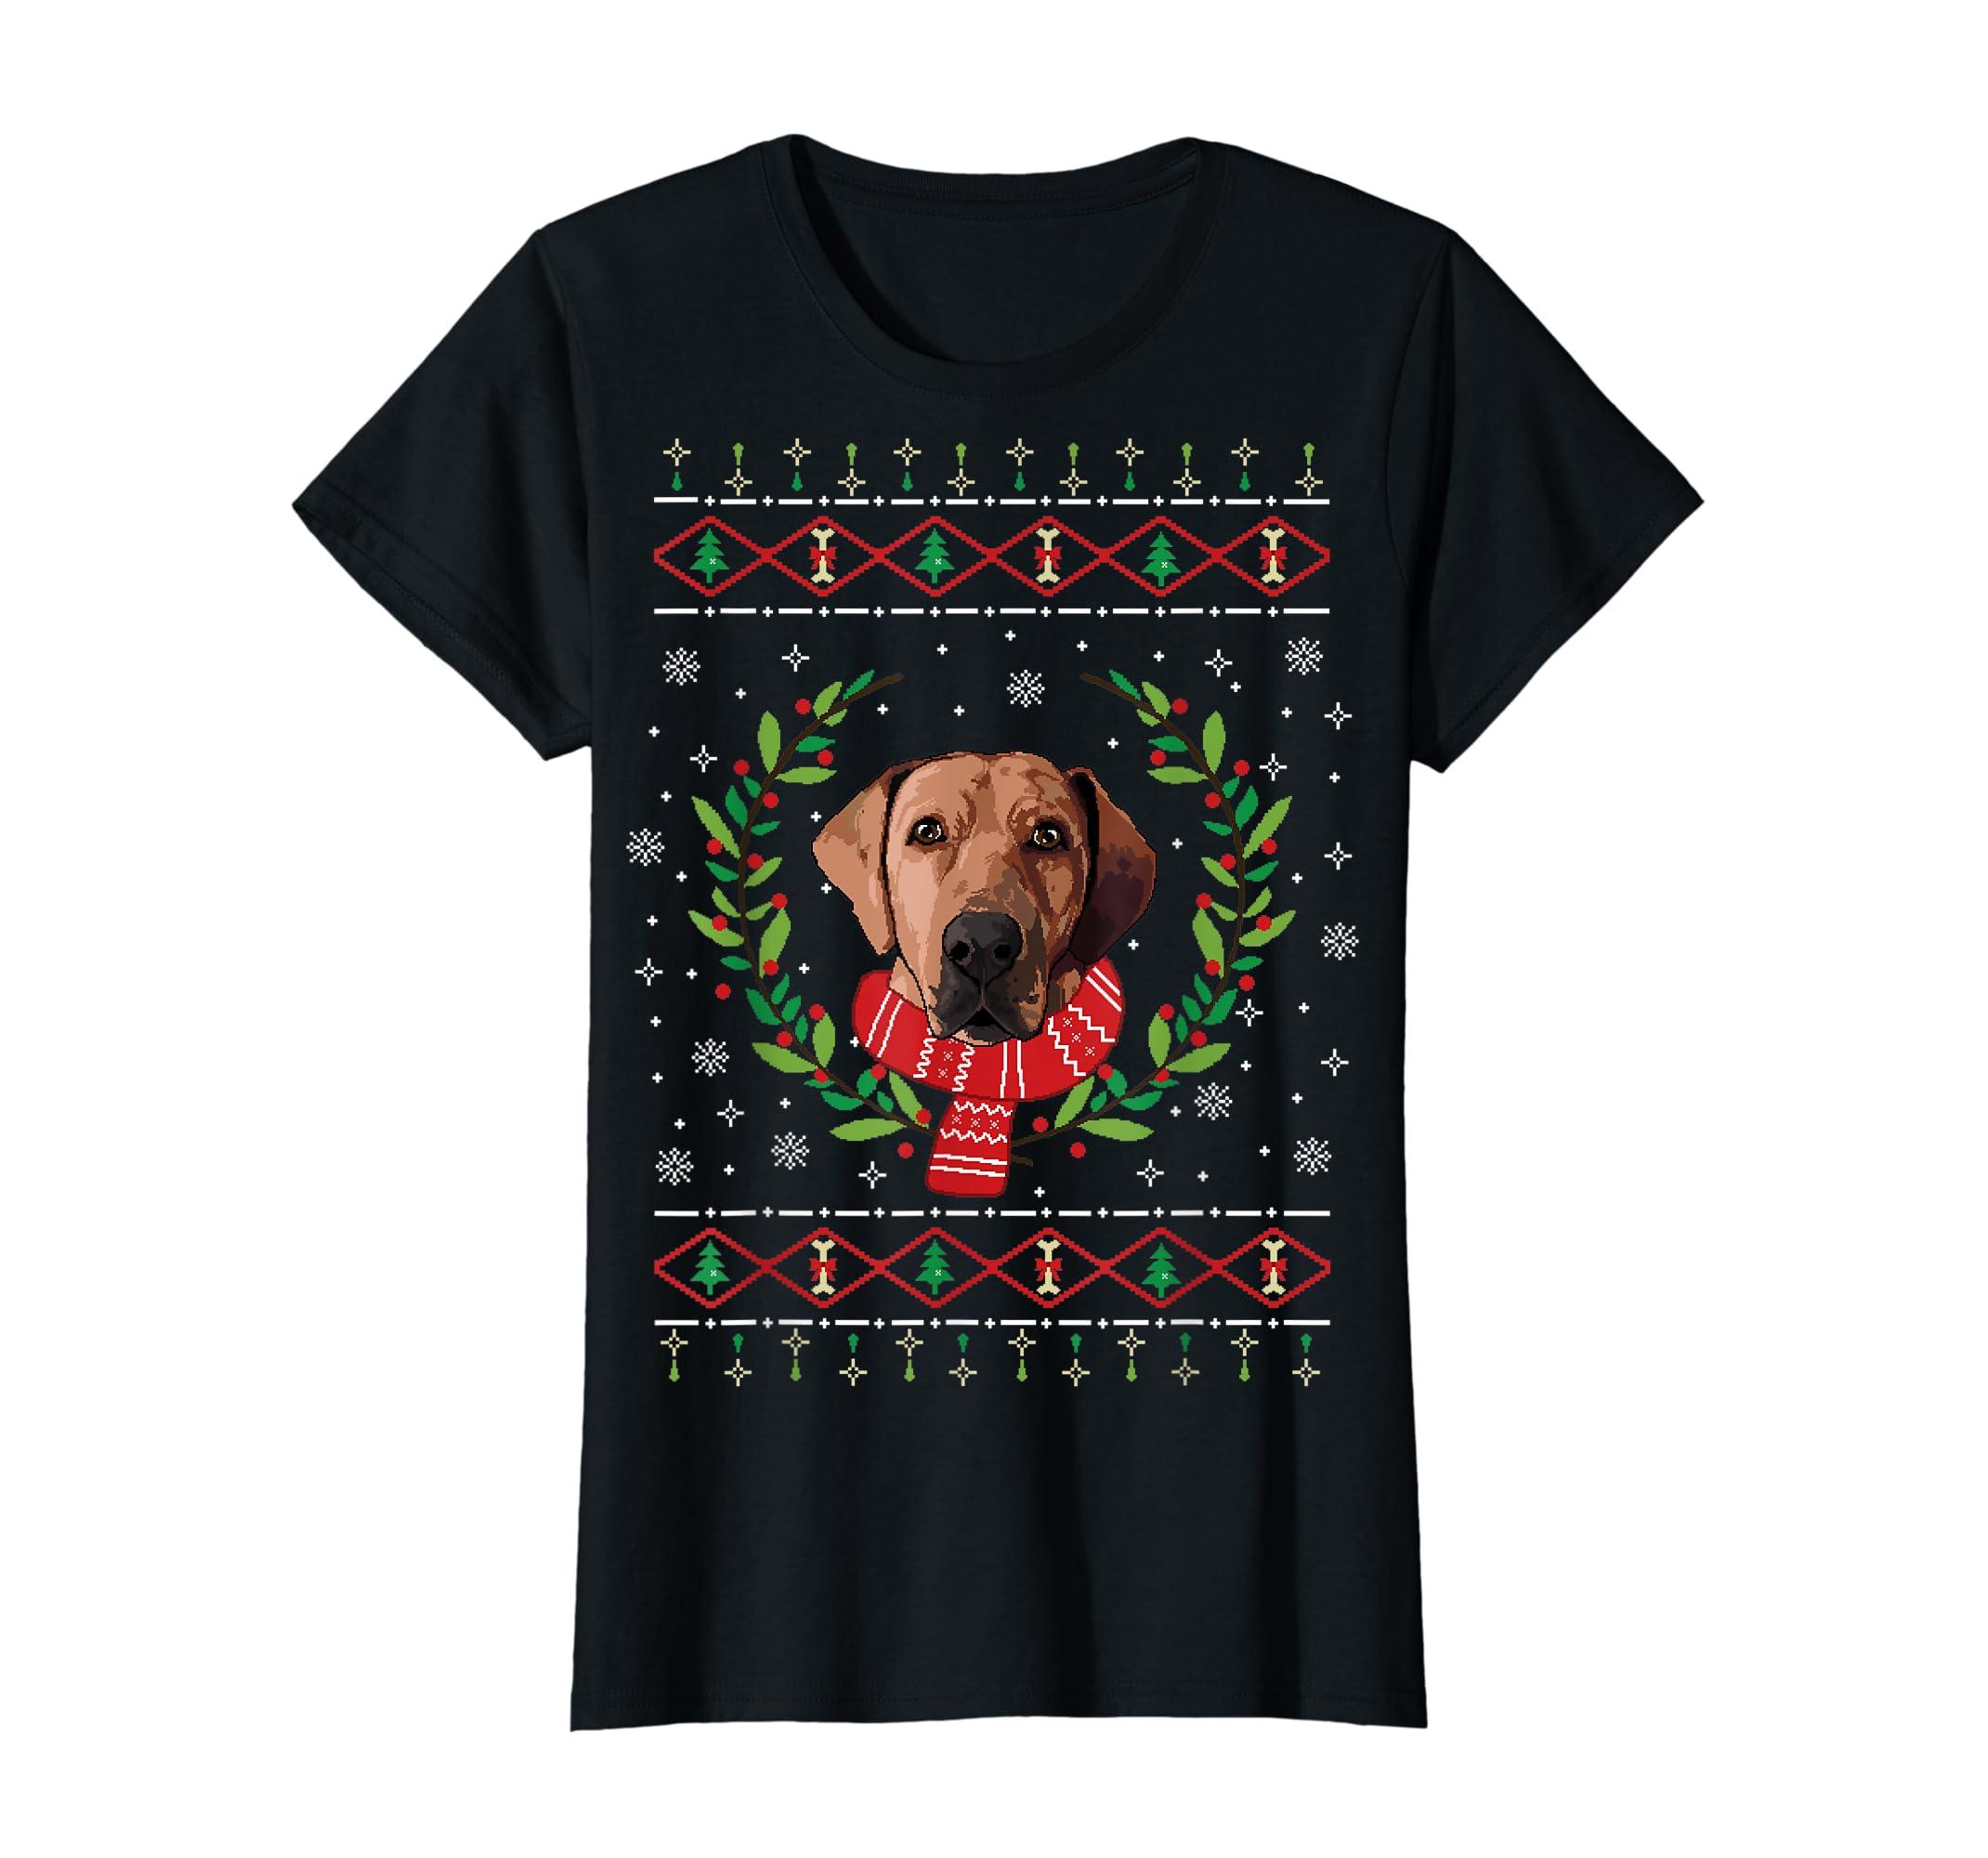 Broholmer Ugly Christmas Jumper T-Shirt Gift T-Shirt-Women's T-Shirt-Black